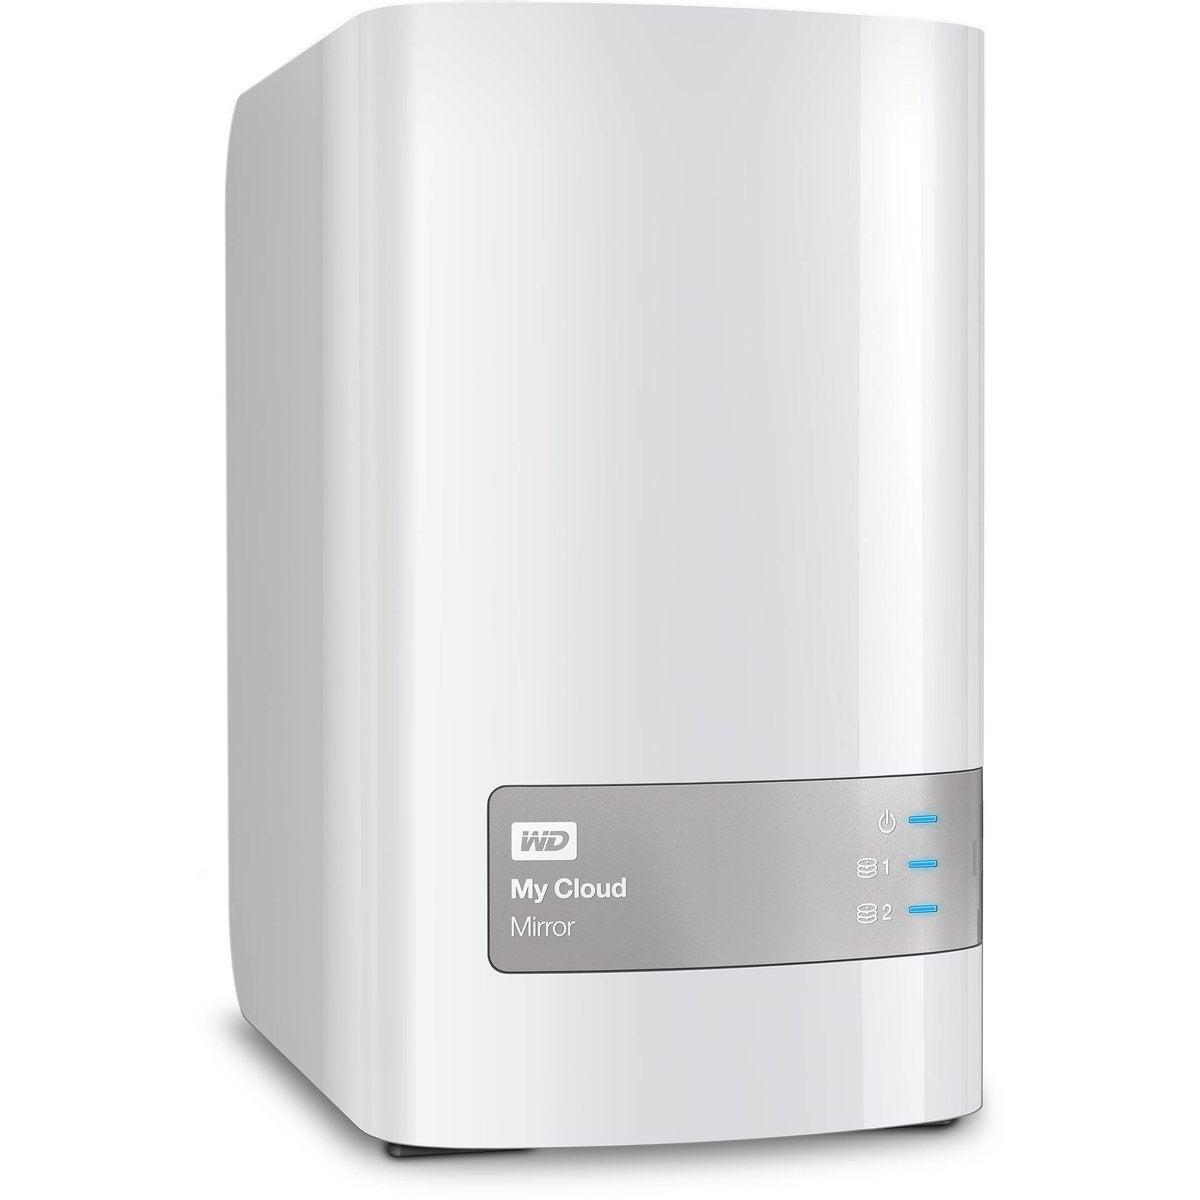 Western Digital My Cloud Mirror WDBWVZ0060J 6TB Hard Drive